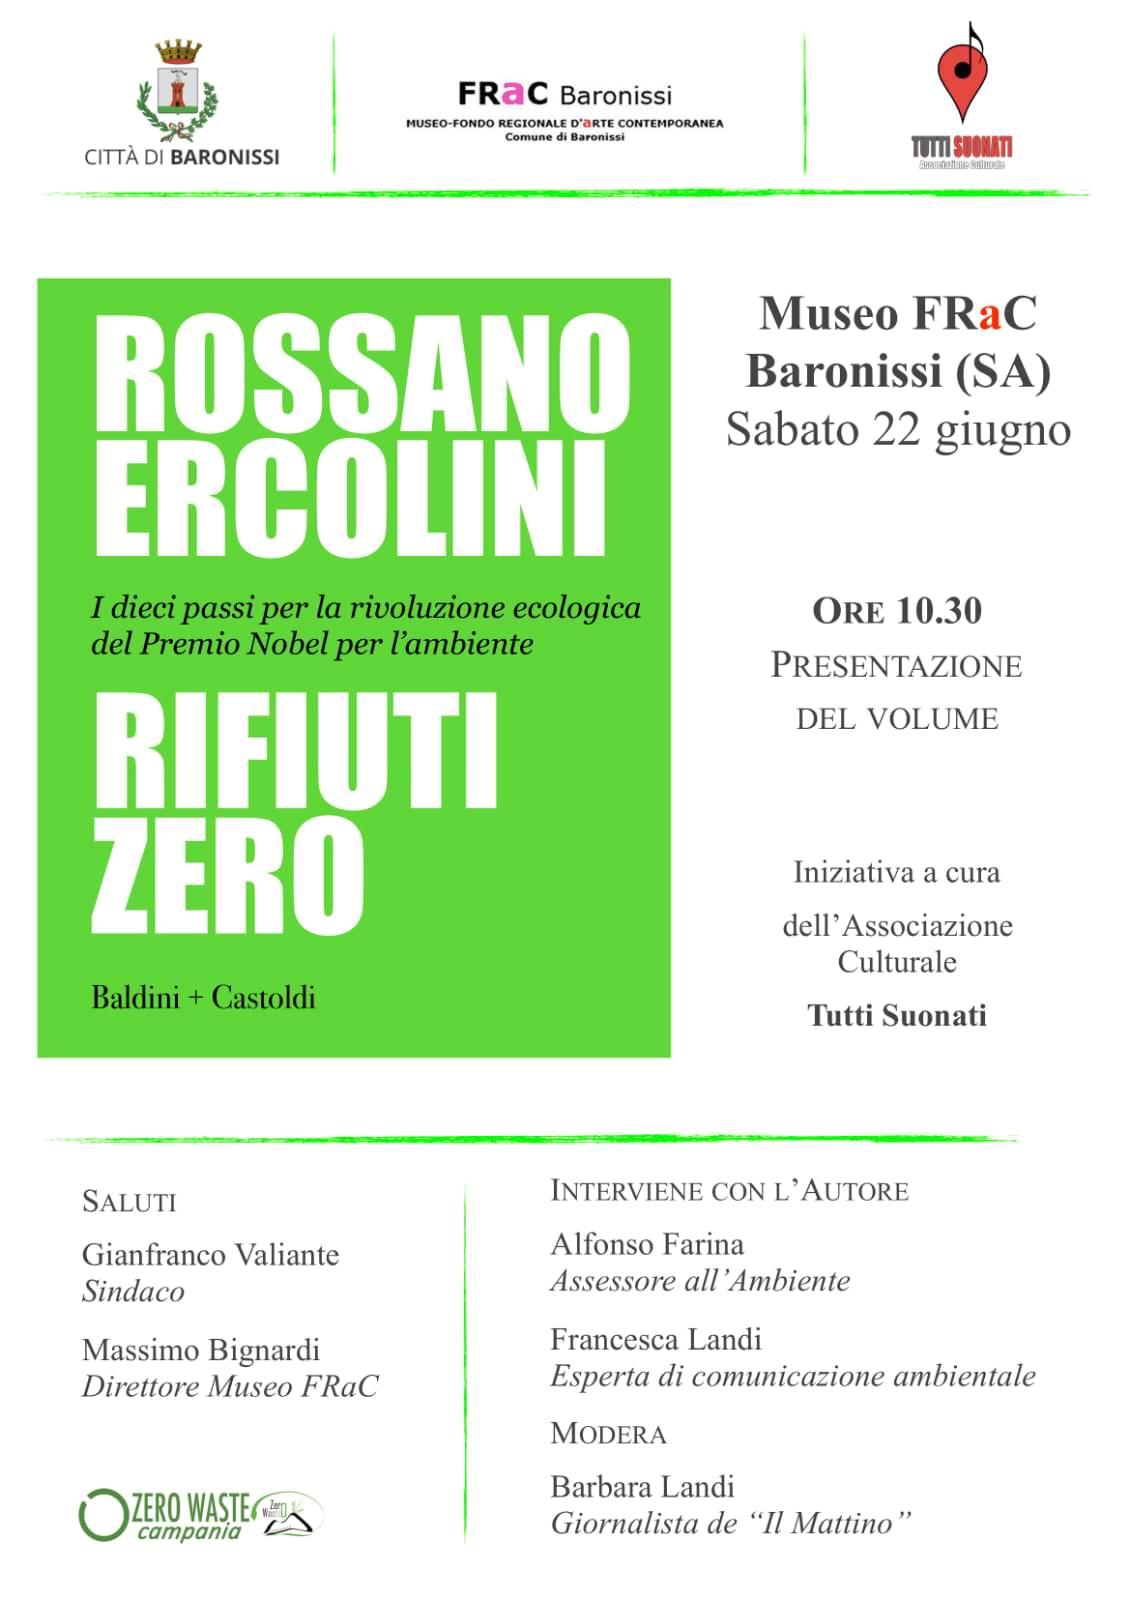 https://www.salernocitta.com/wp-content/uploads/2019/06/rossano1.jpg